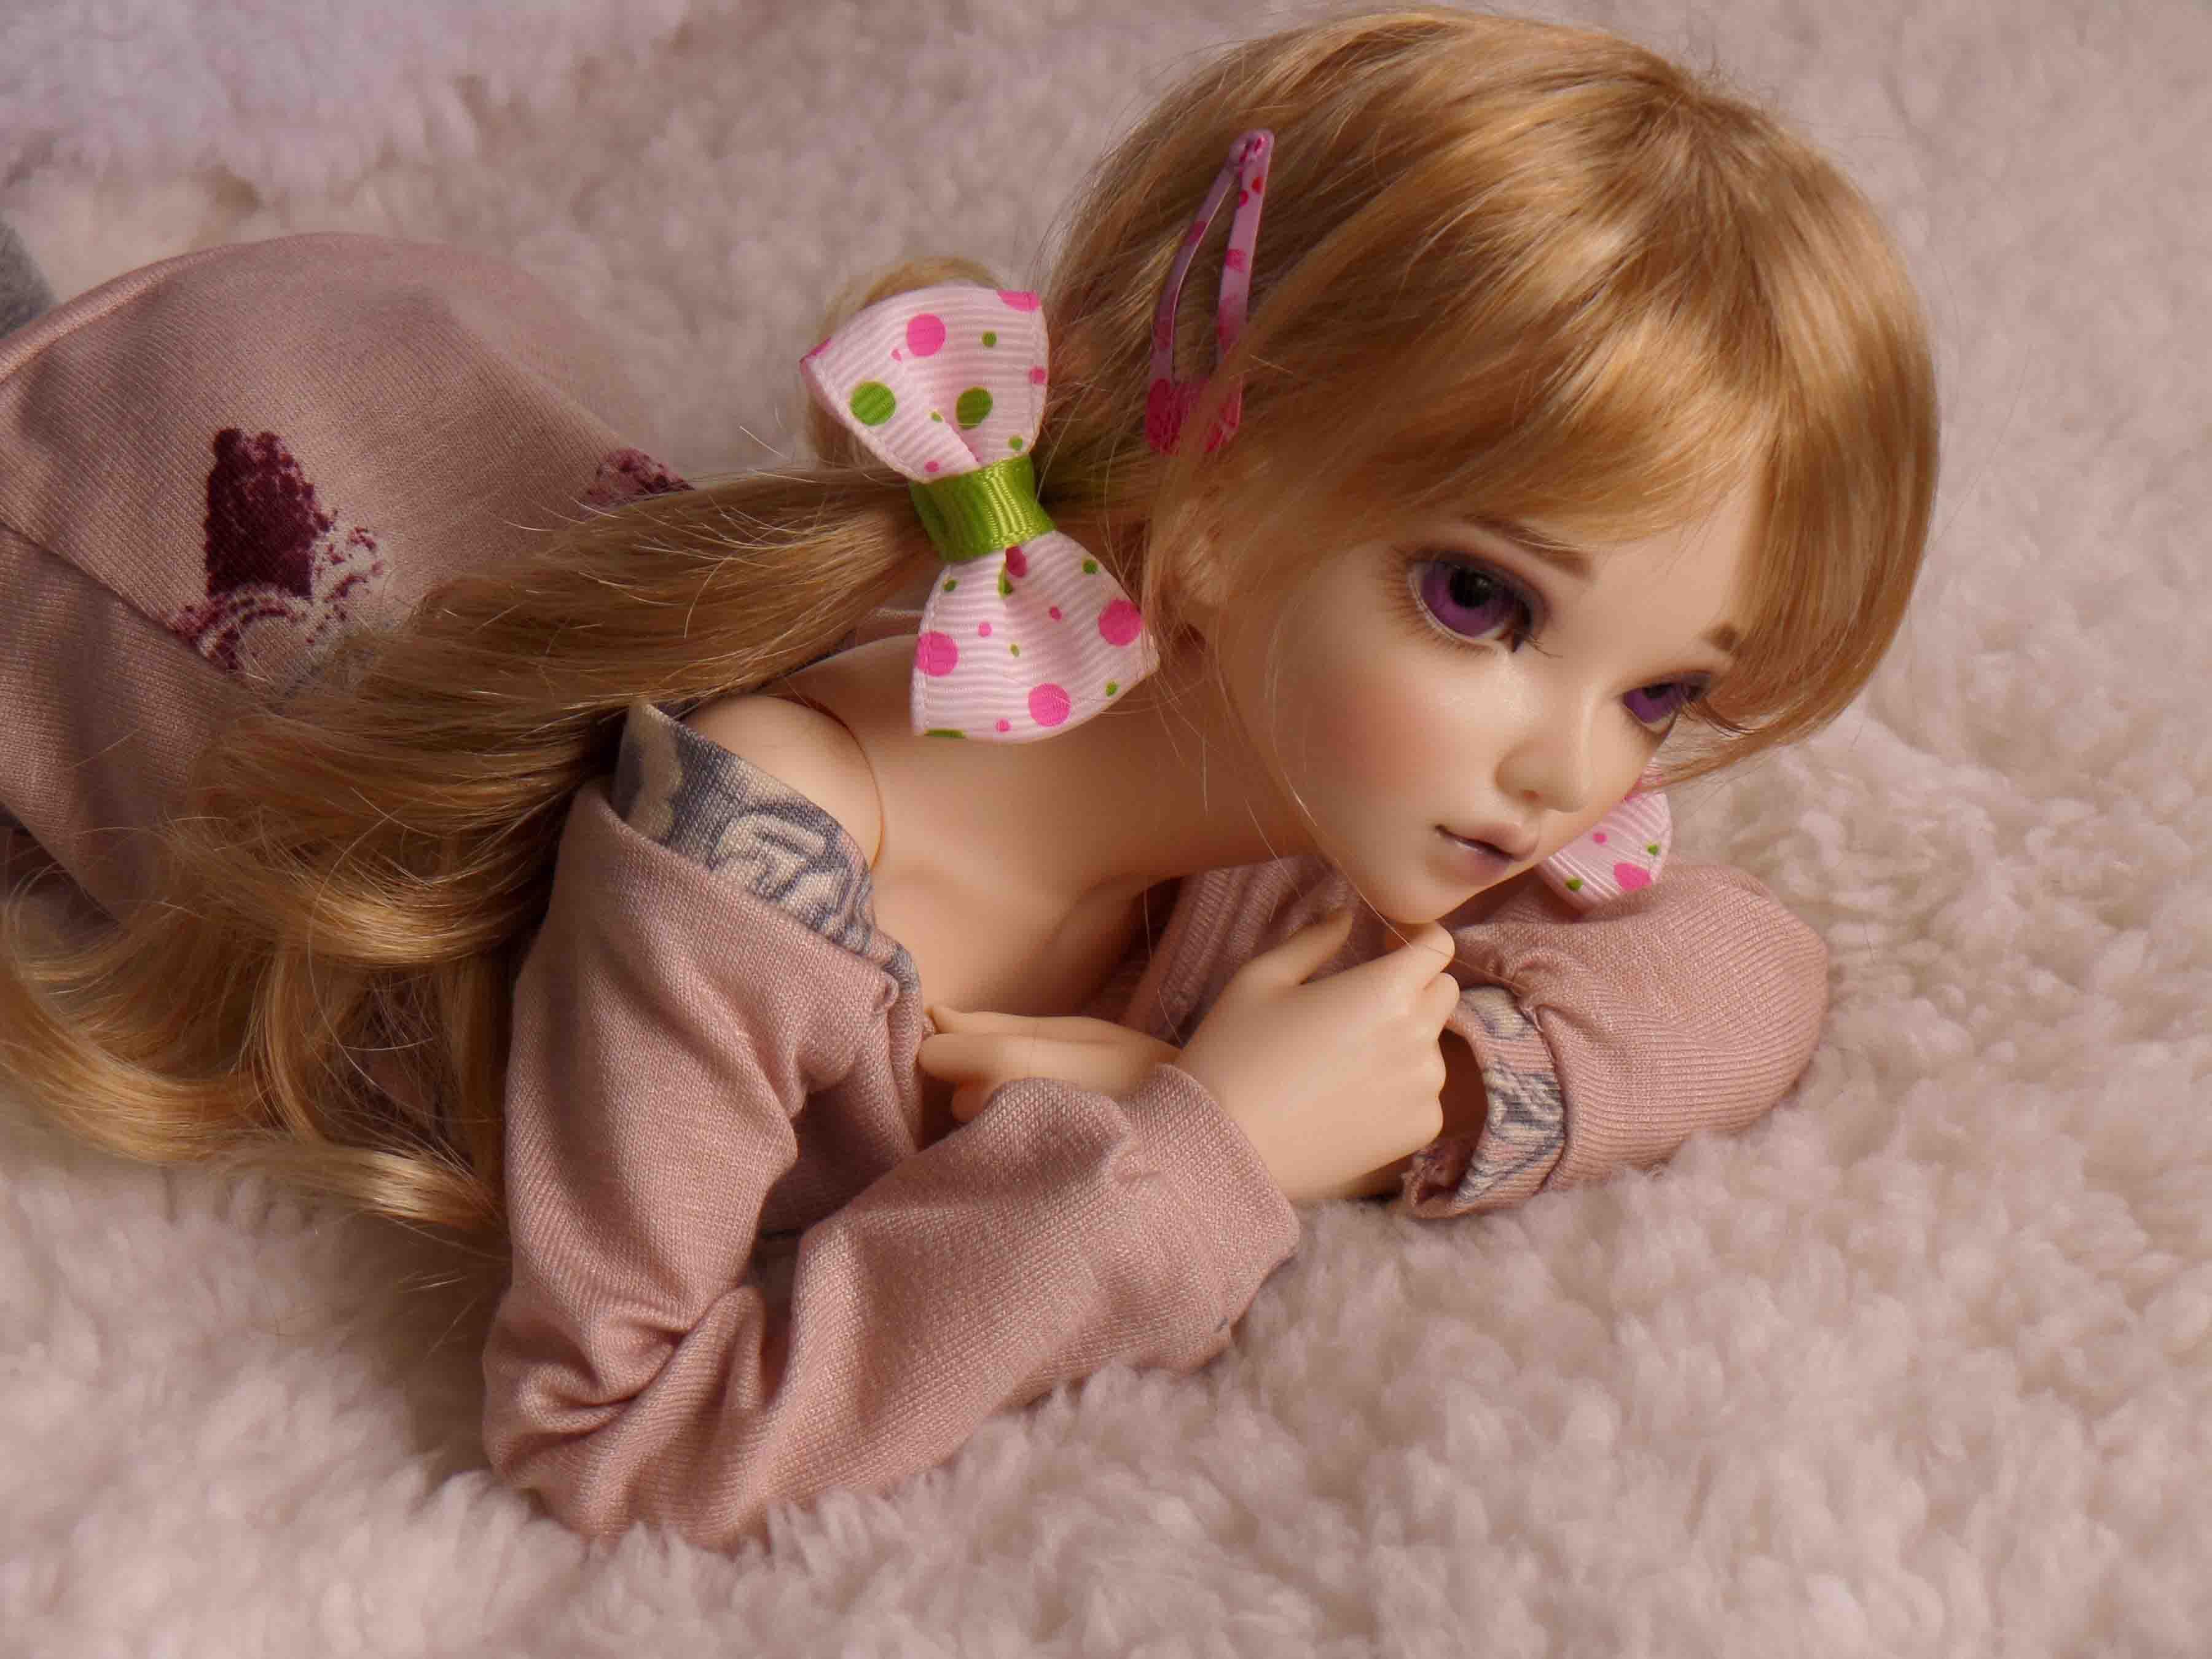 Barbie Dolls Hd Wallpaper Free Download: Barbie Doll Wallpapers